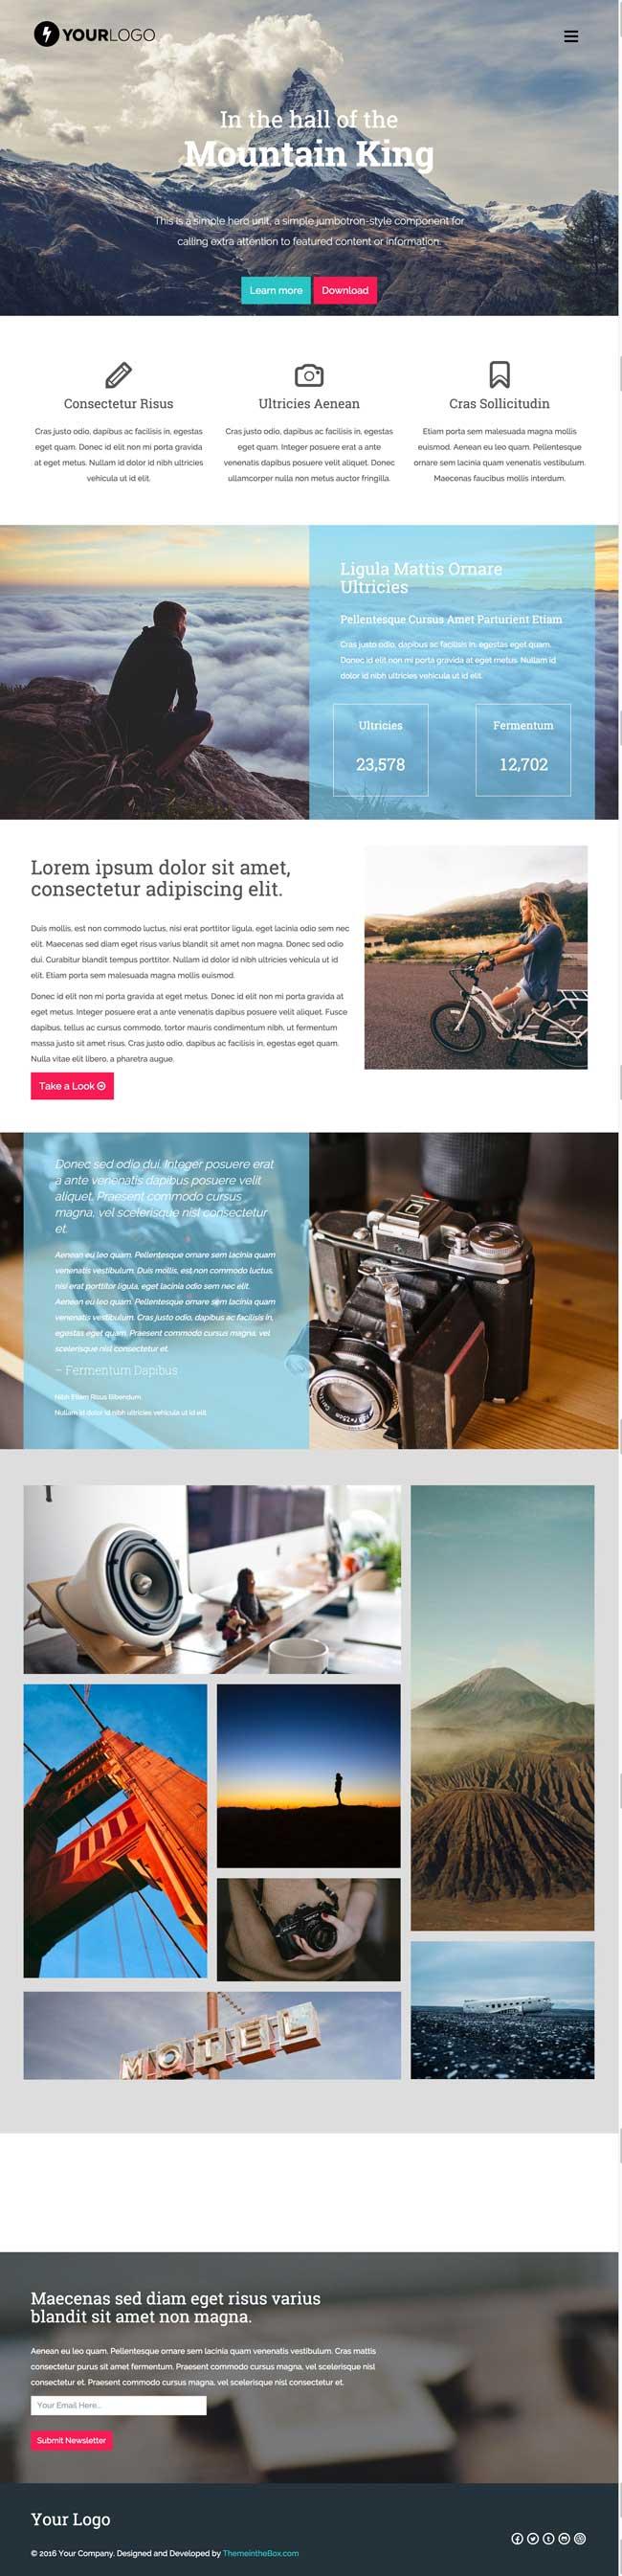 35+ Best Responsive HTML5 CSS3 Website Templates 2016